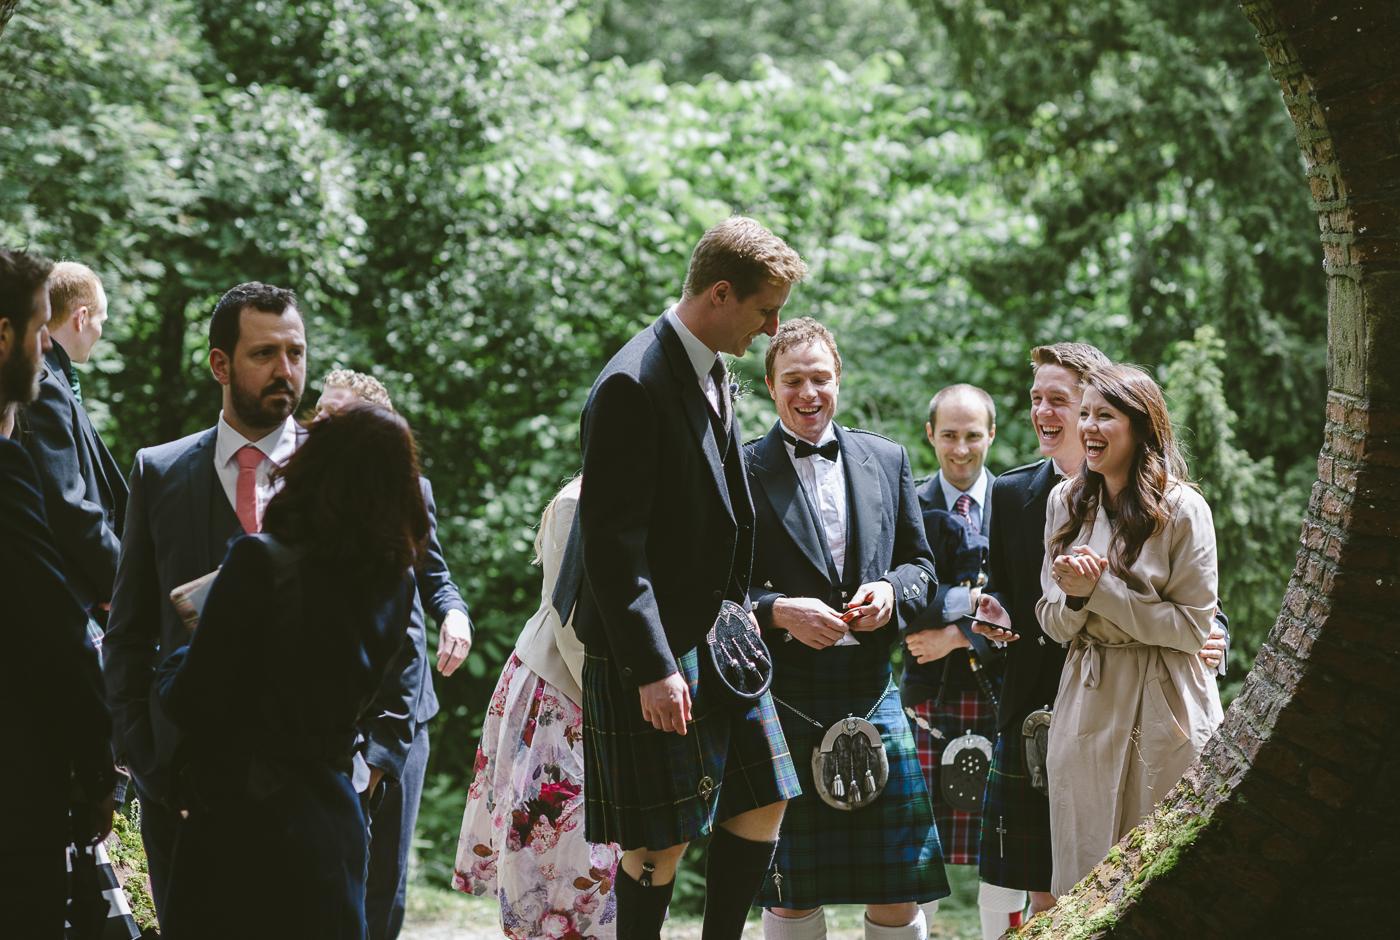 Dreangh_estate_Wedding_northern_ireland_franics_meaney_photography_inspire-weddings_5.jpg